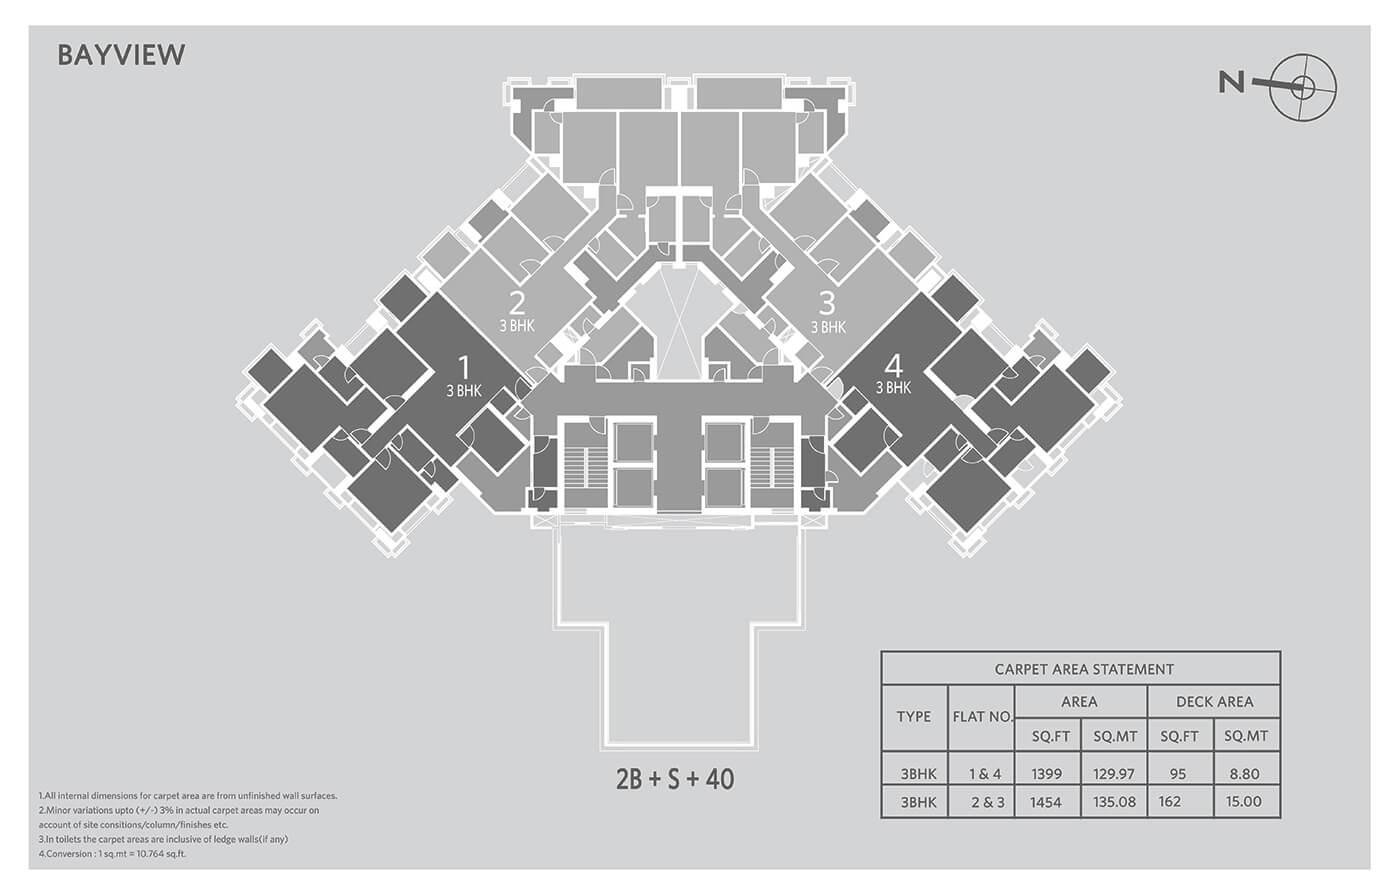 bayview-keyplan_1